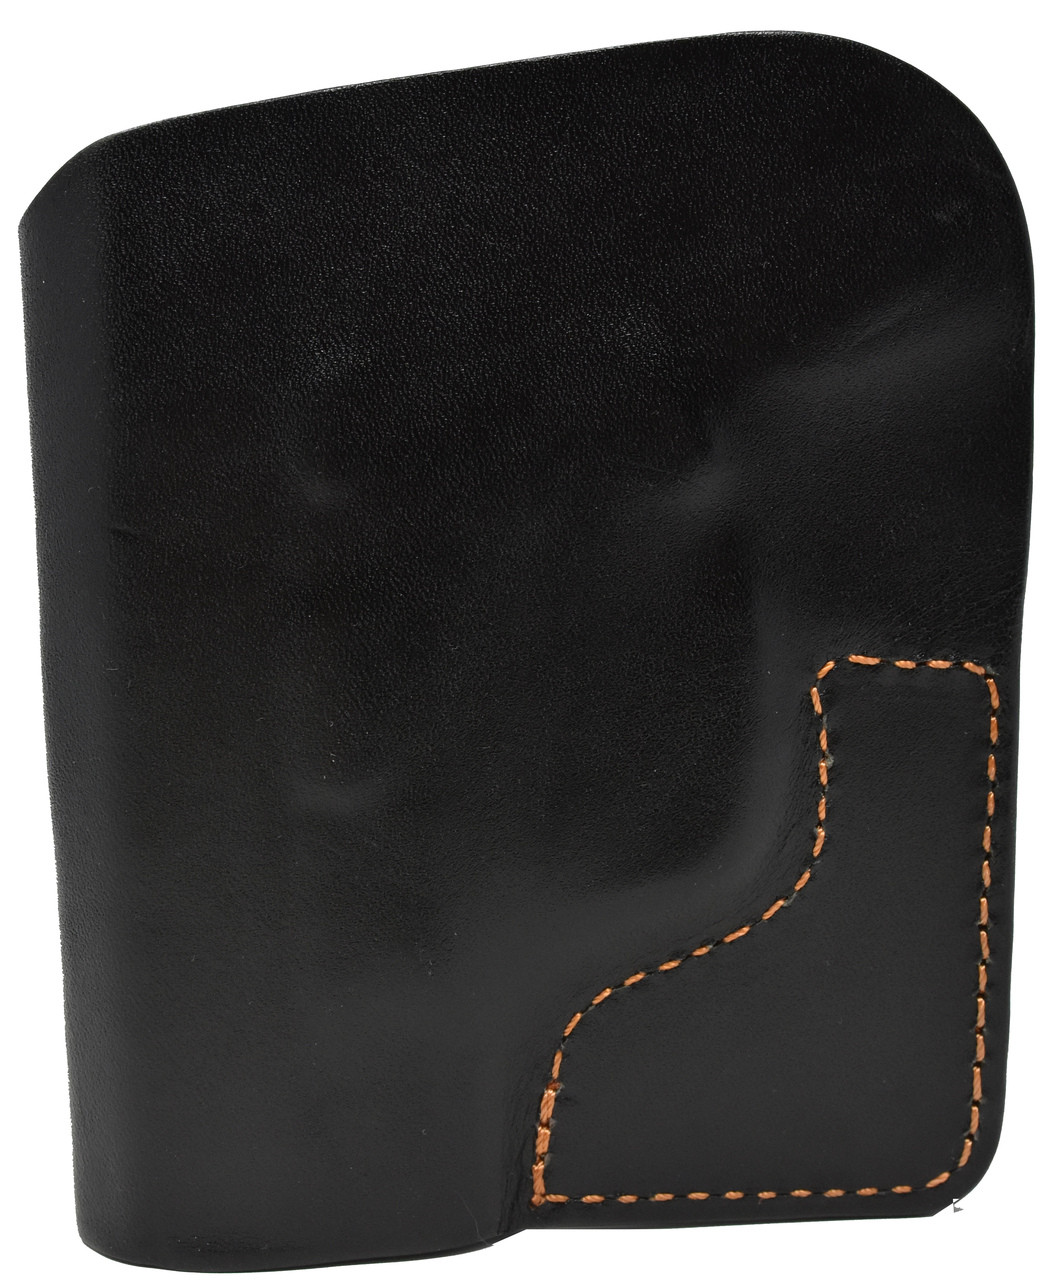 Black Italian Leather Pocket Holster for Beretta Pico 380 and Similar Guns